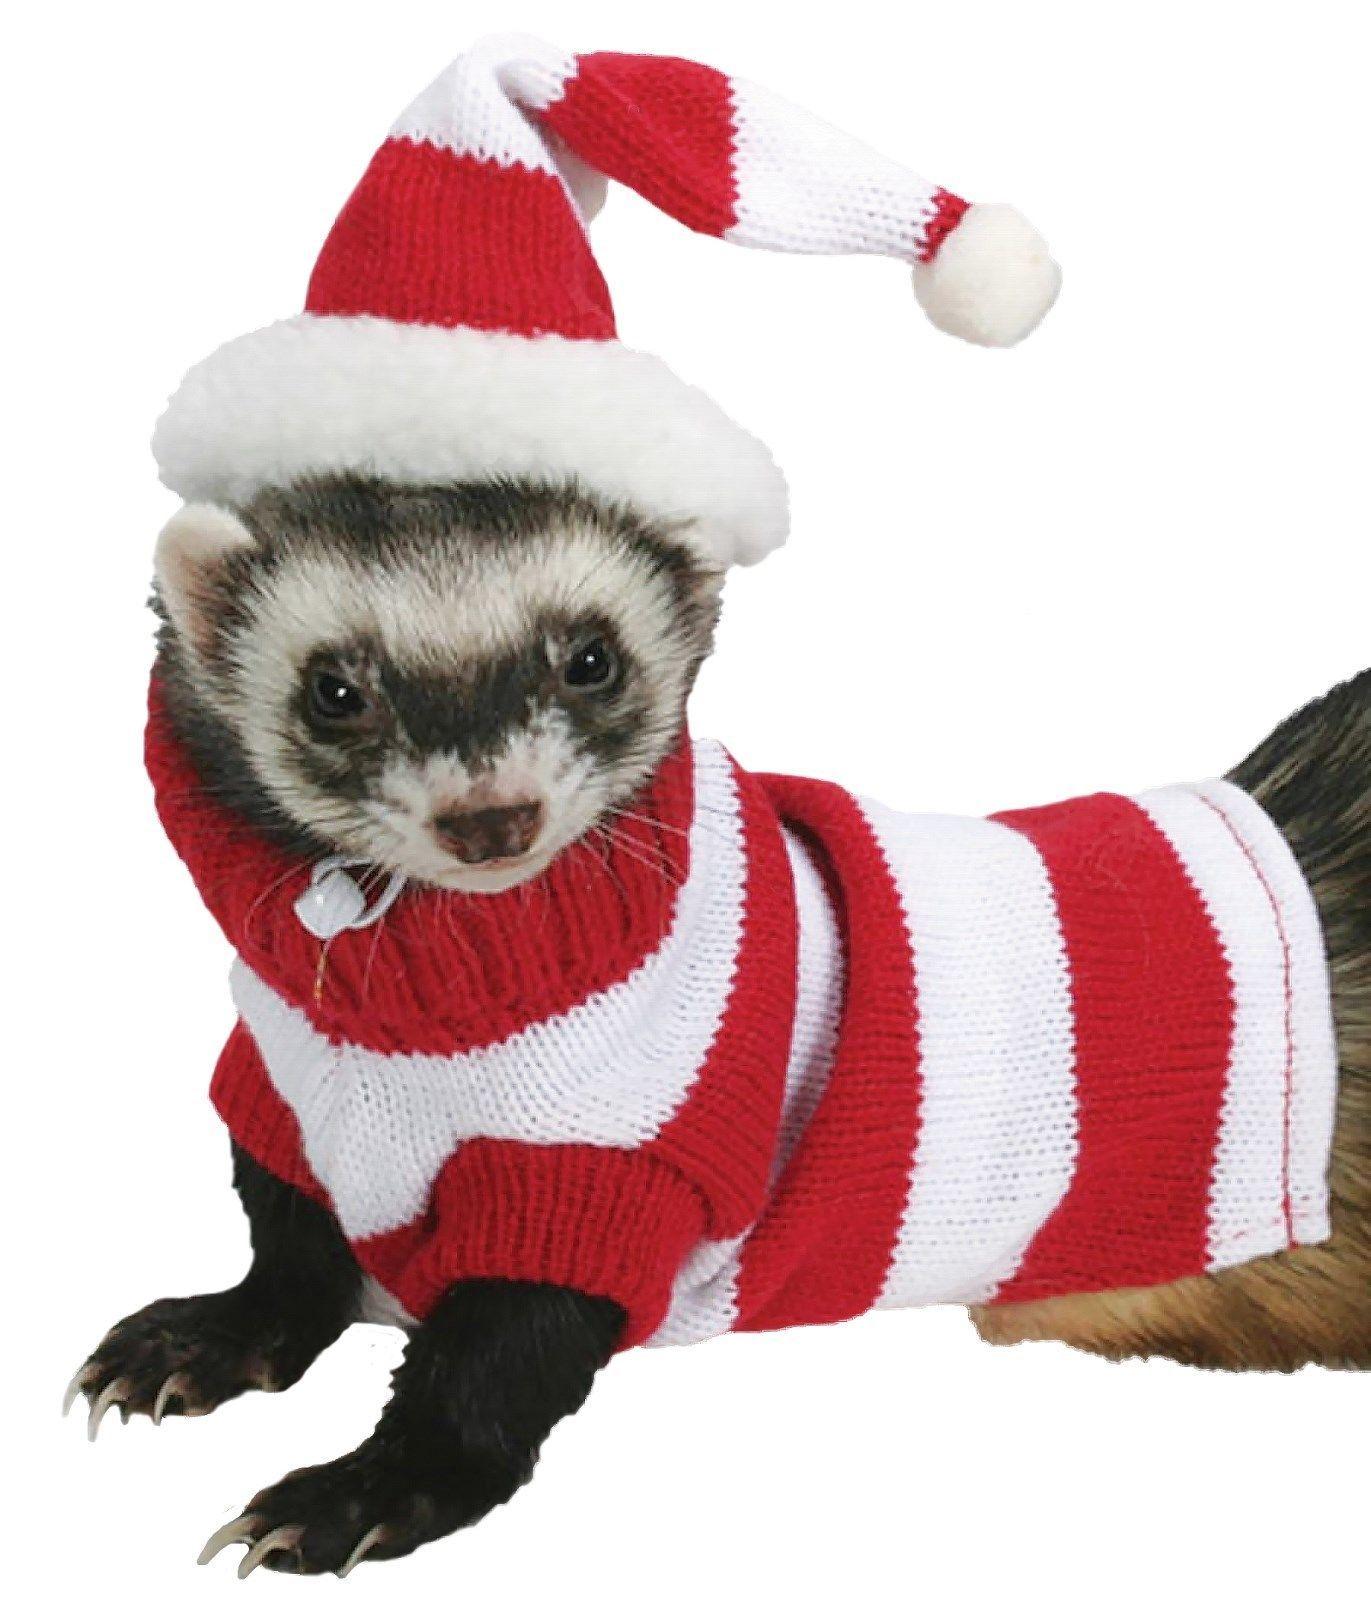 11 03 Marshall Pet Ferret Tiny Dog Jacket Hat Sweater Set 3 5 Lbs Red White Stripe Ebay Home Garden Pet Ferret Ferret Ferret Clothes